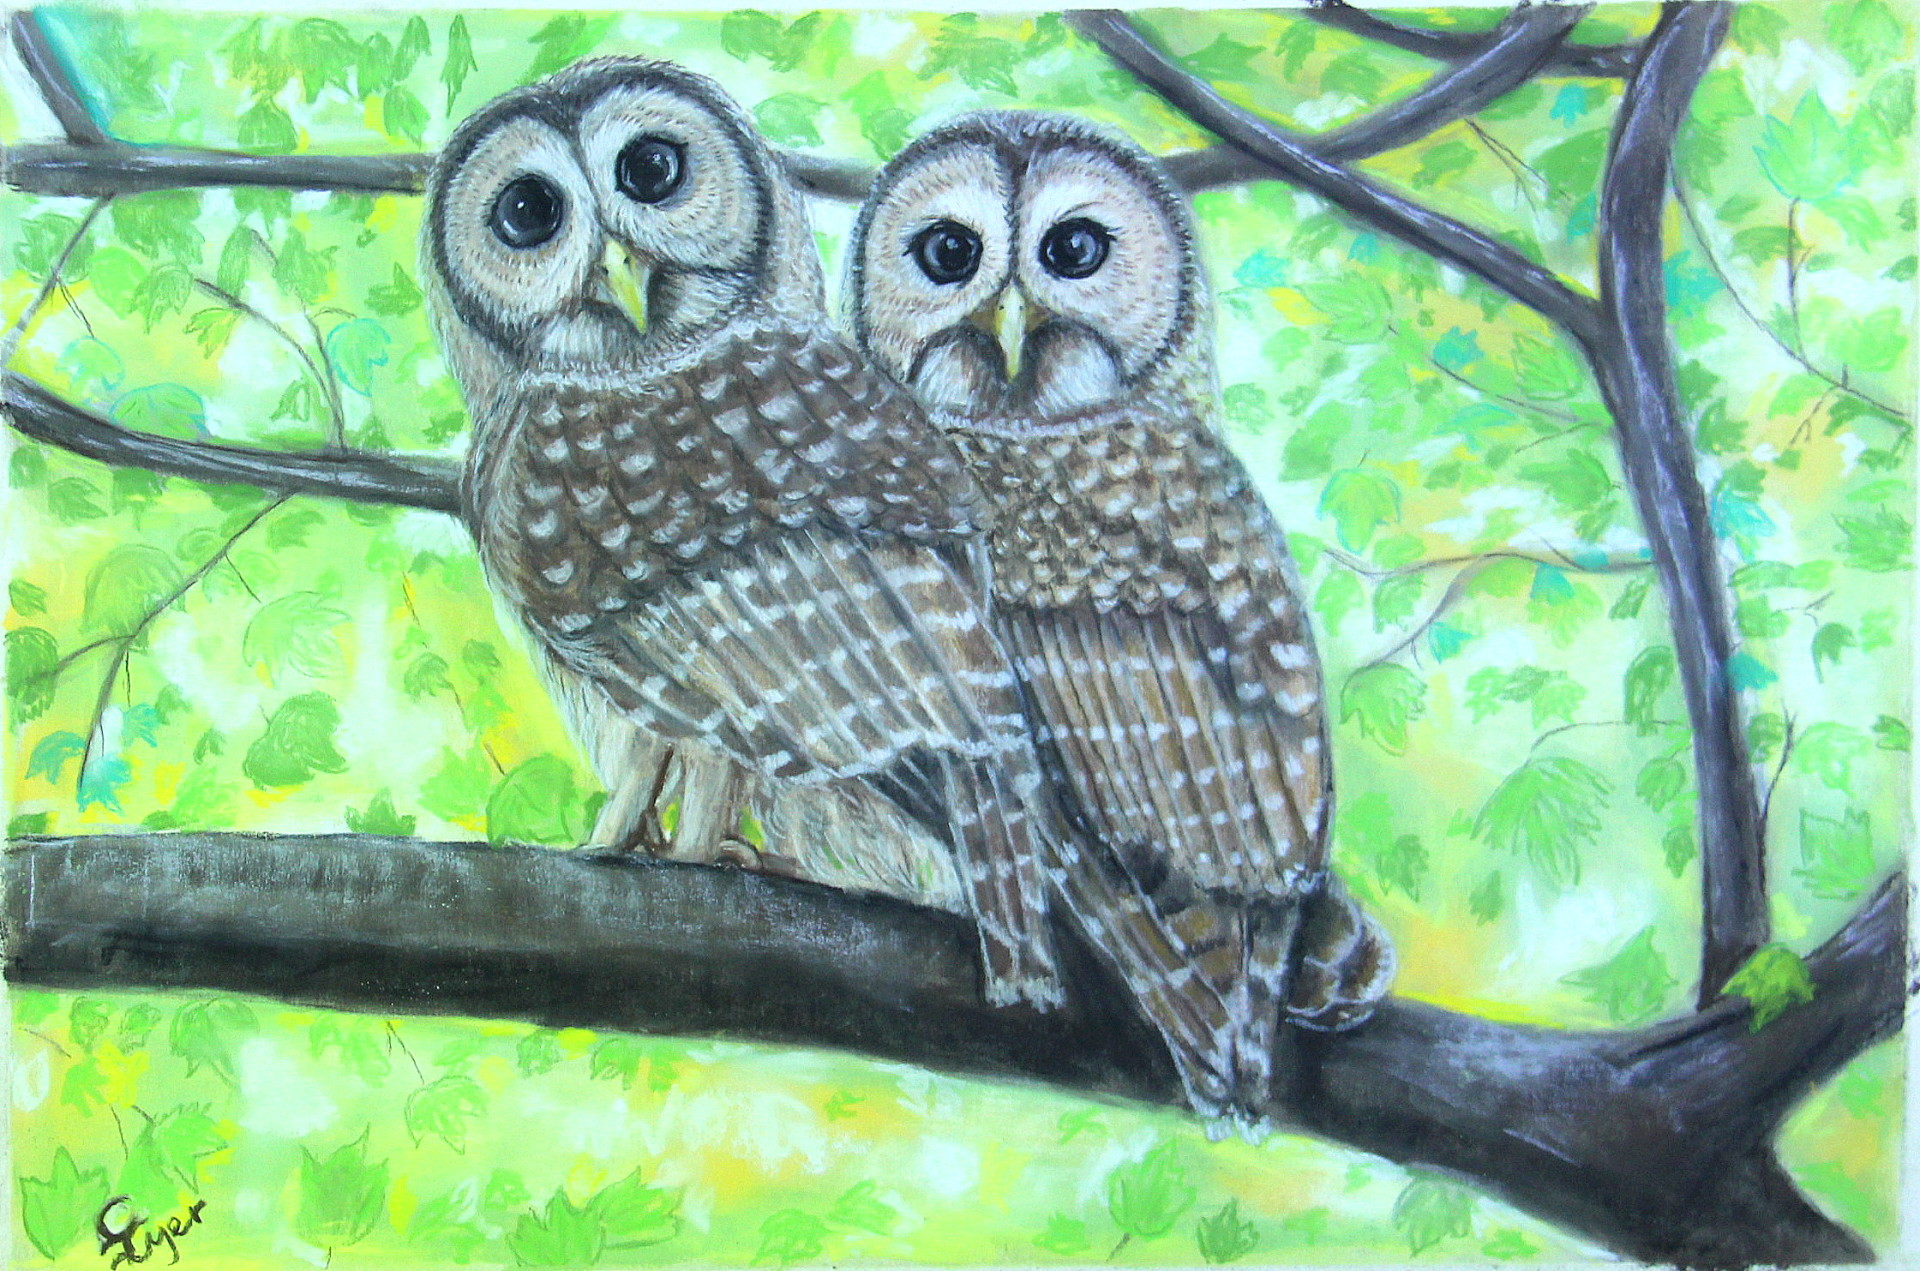 Visiting Barred Owls